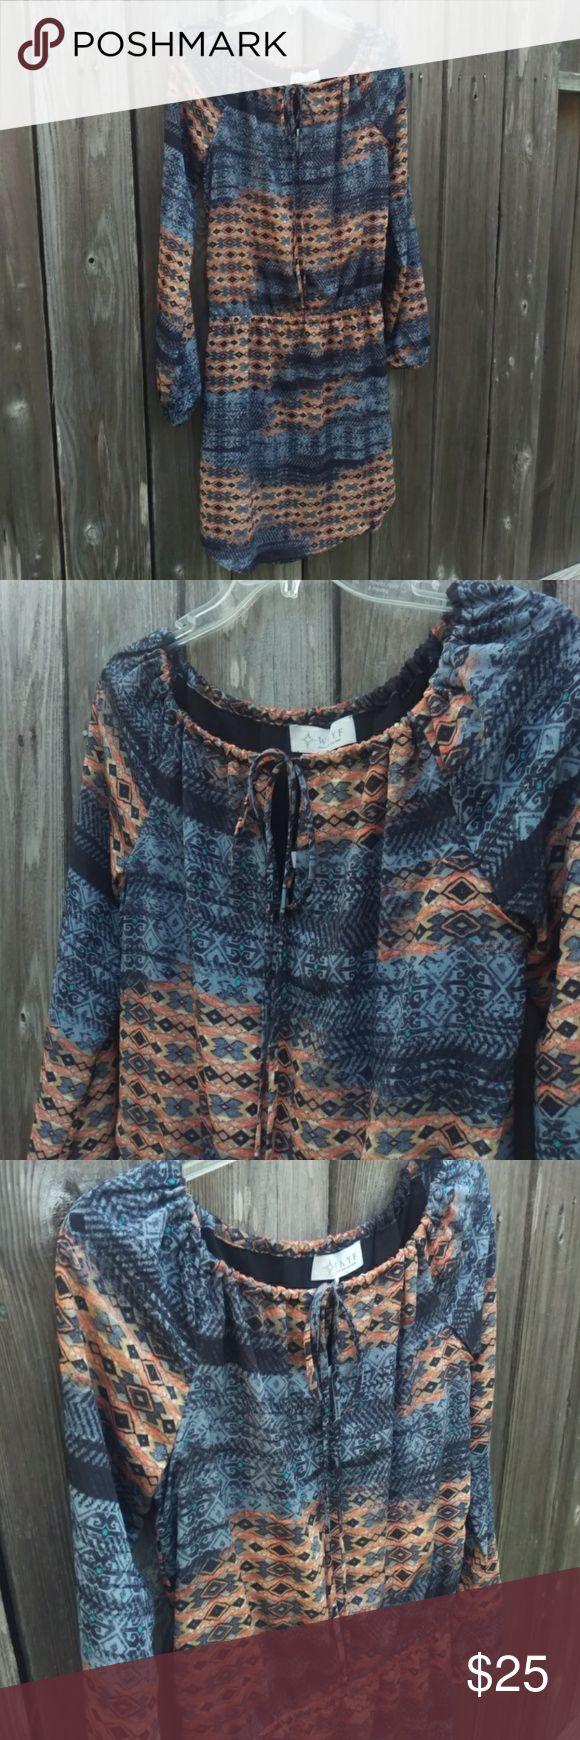 NWT WAYF Aztec Print Dress NWT WAYF Blue and Gold Long Sleeve Aztec Print Dress wayf Dresses Long Sleeve